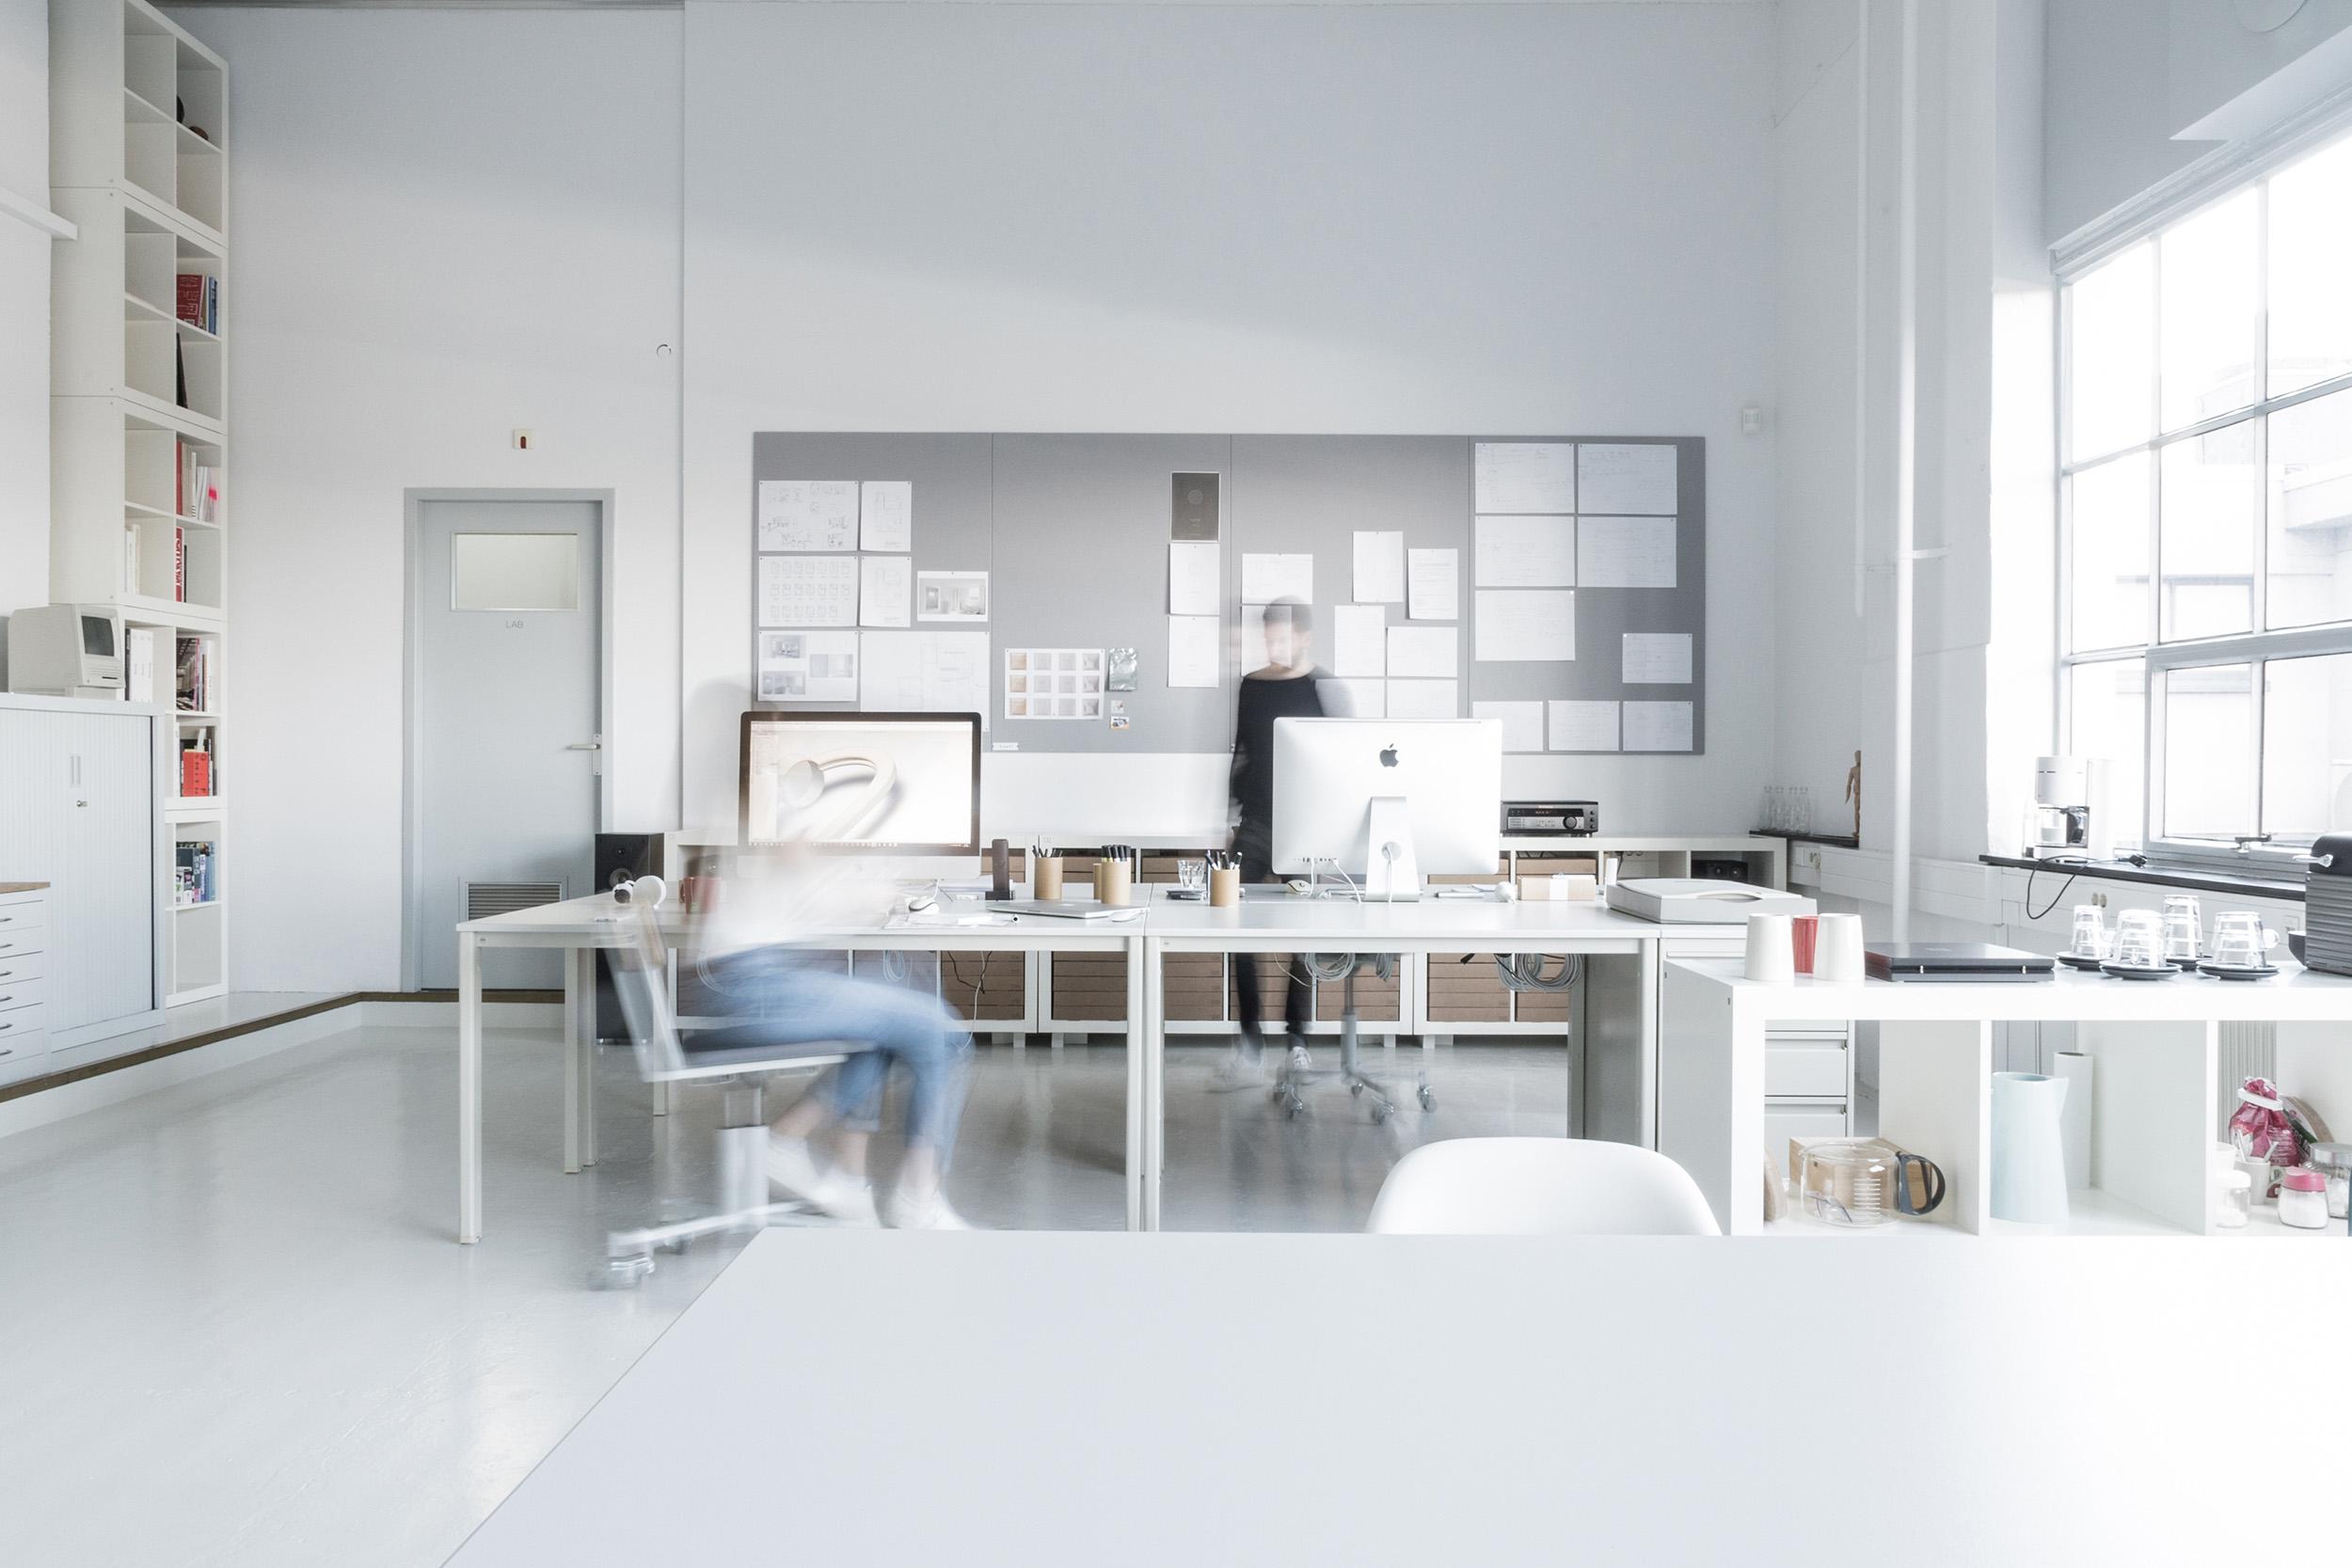 Design Meubels Eindhoven.Profile Remi Van Oers